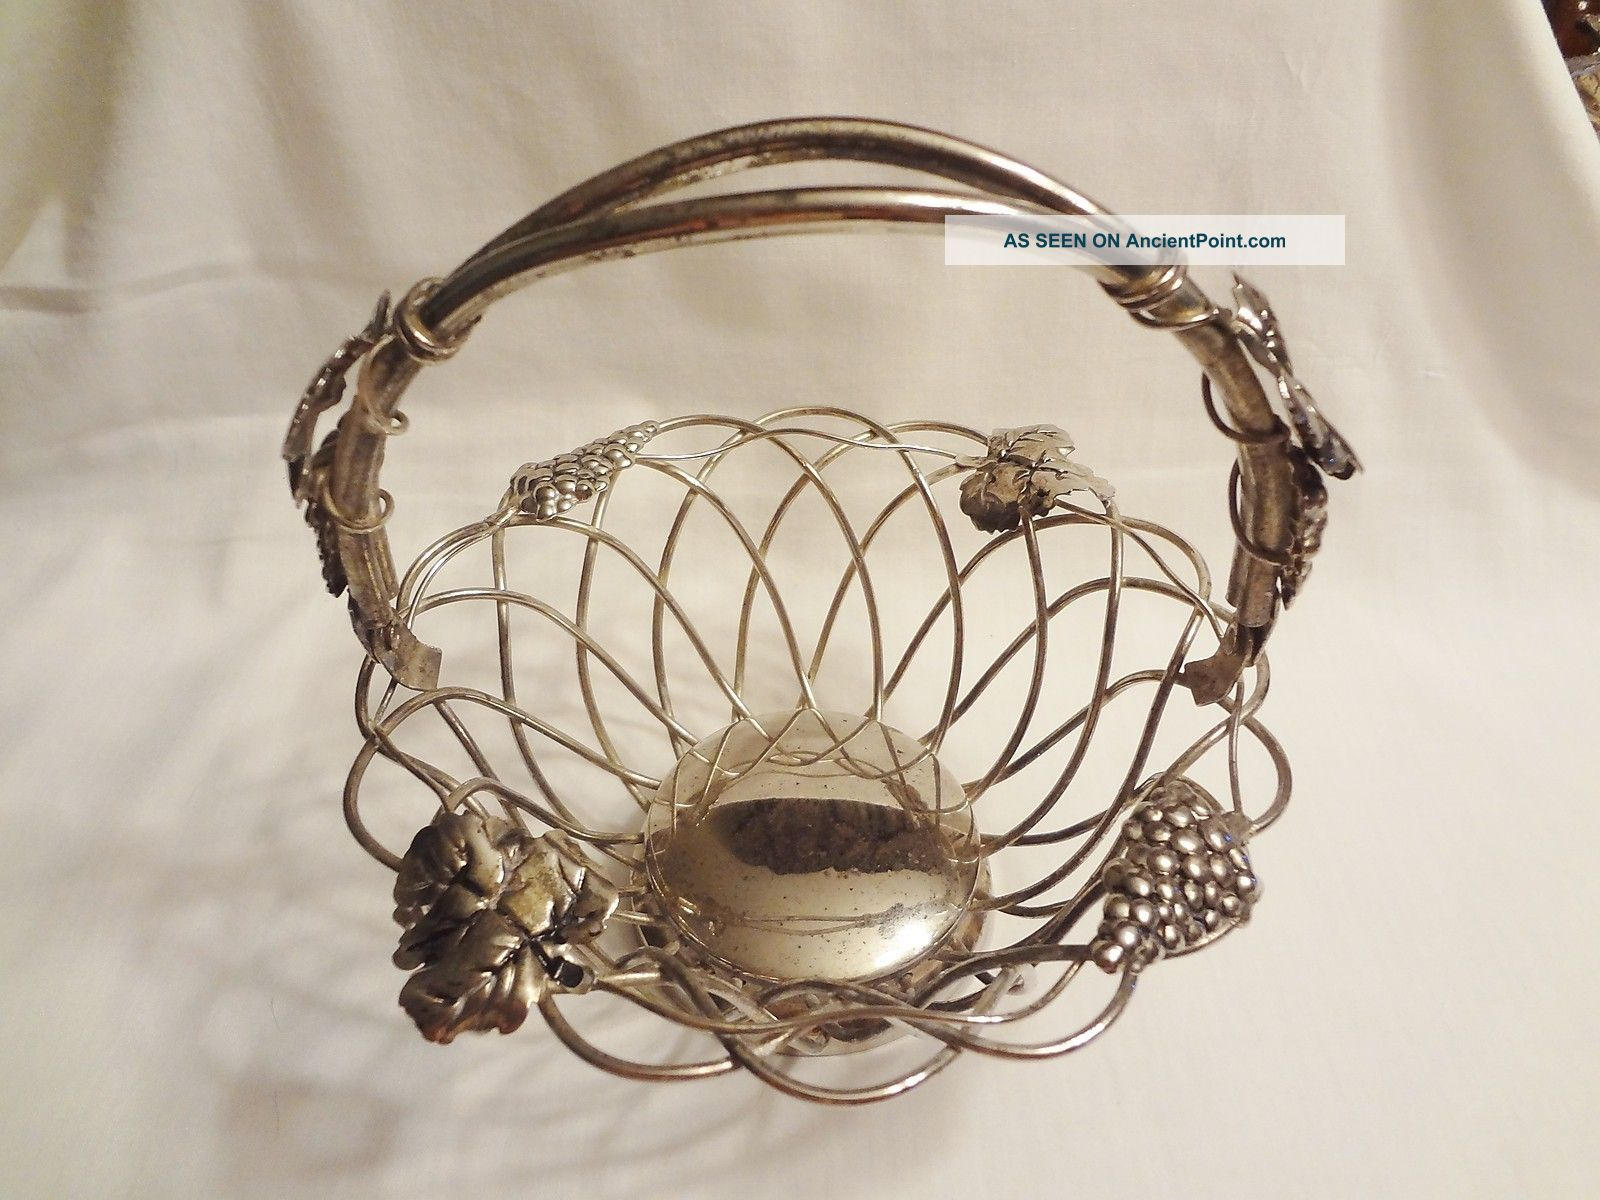 Godinger Silver Basket W/ Hinged Handle 7 1/2